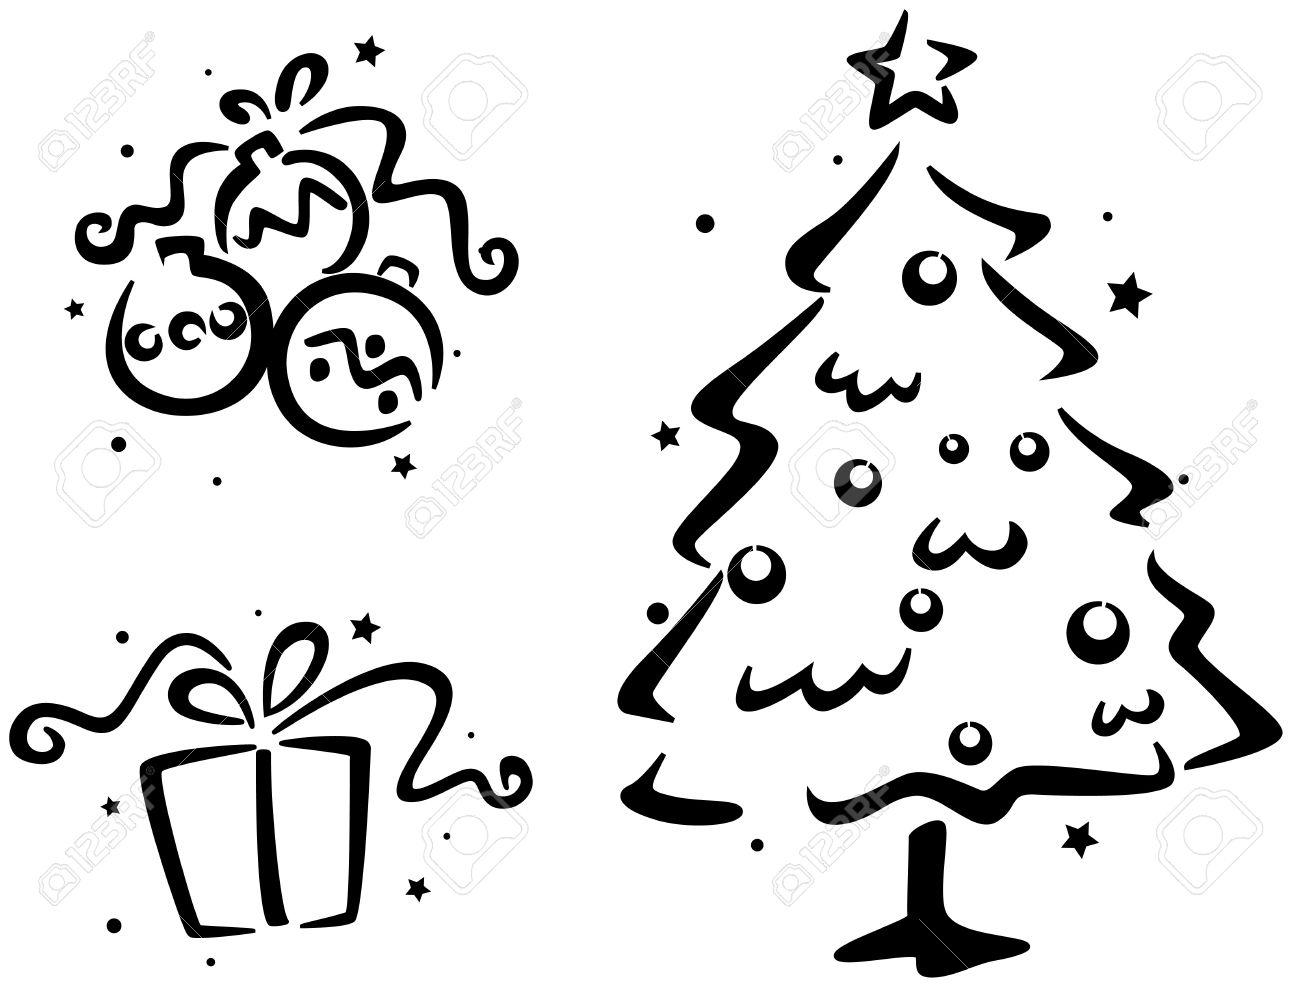 Gabarit De Noël Avec Un Arbre De Noël, Un Cadeau De Noël Et Des Boules De  Noël serapportantà Gabarit Sapin De Noel